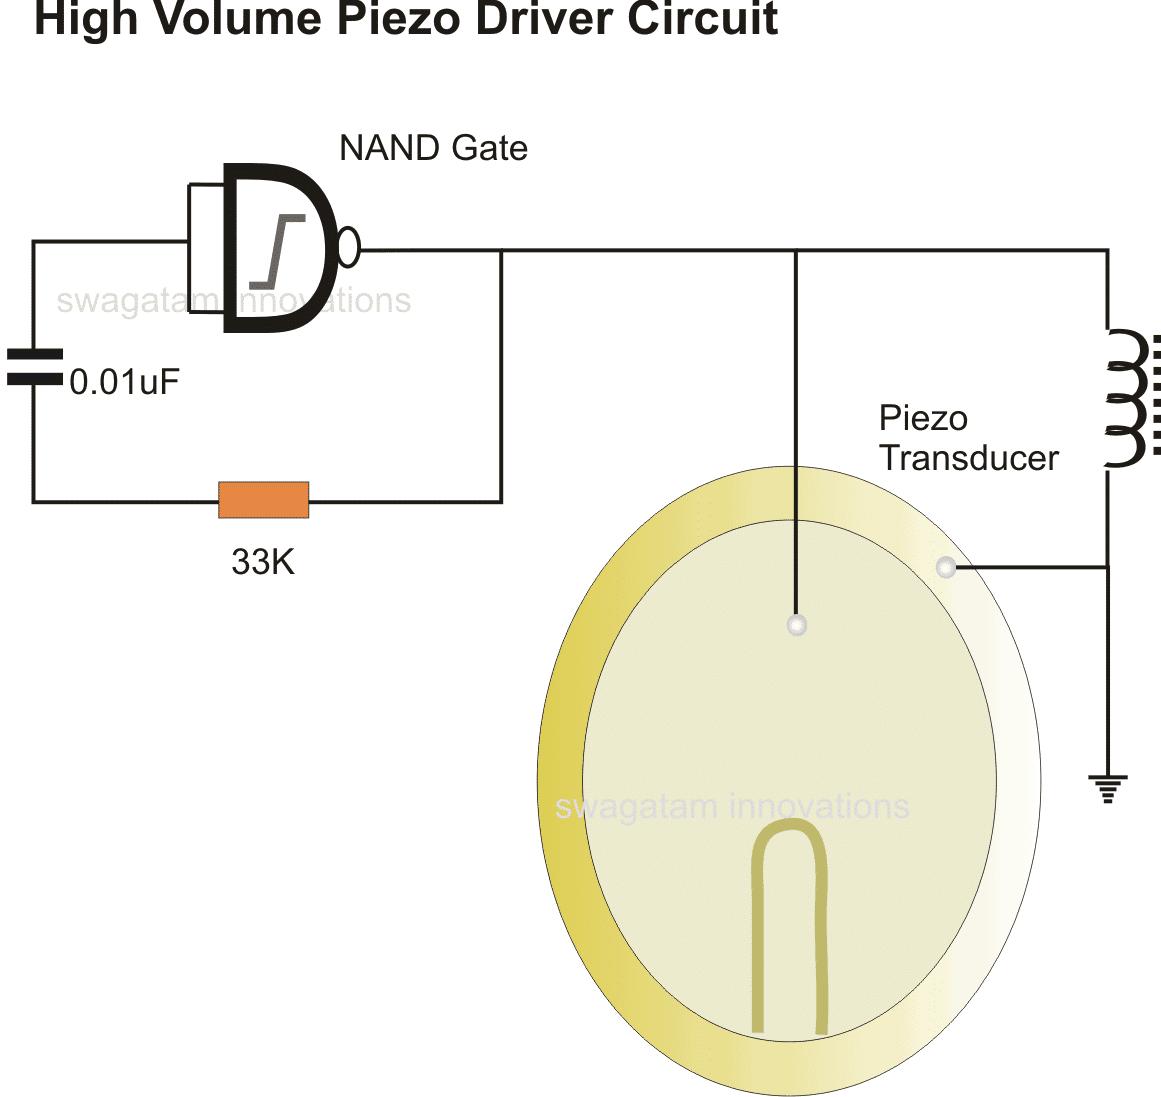 piezo transducer wiring diagram mb 1786  simplepiezotransducercircuitpng  mb 1786  simplepiezotransducercircuitpng